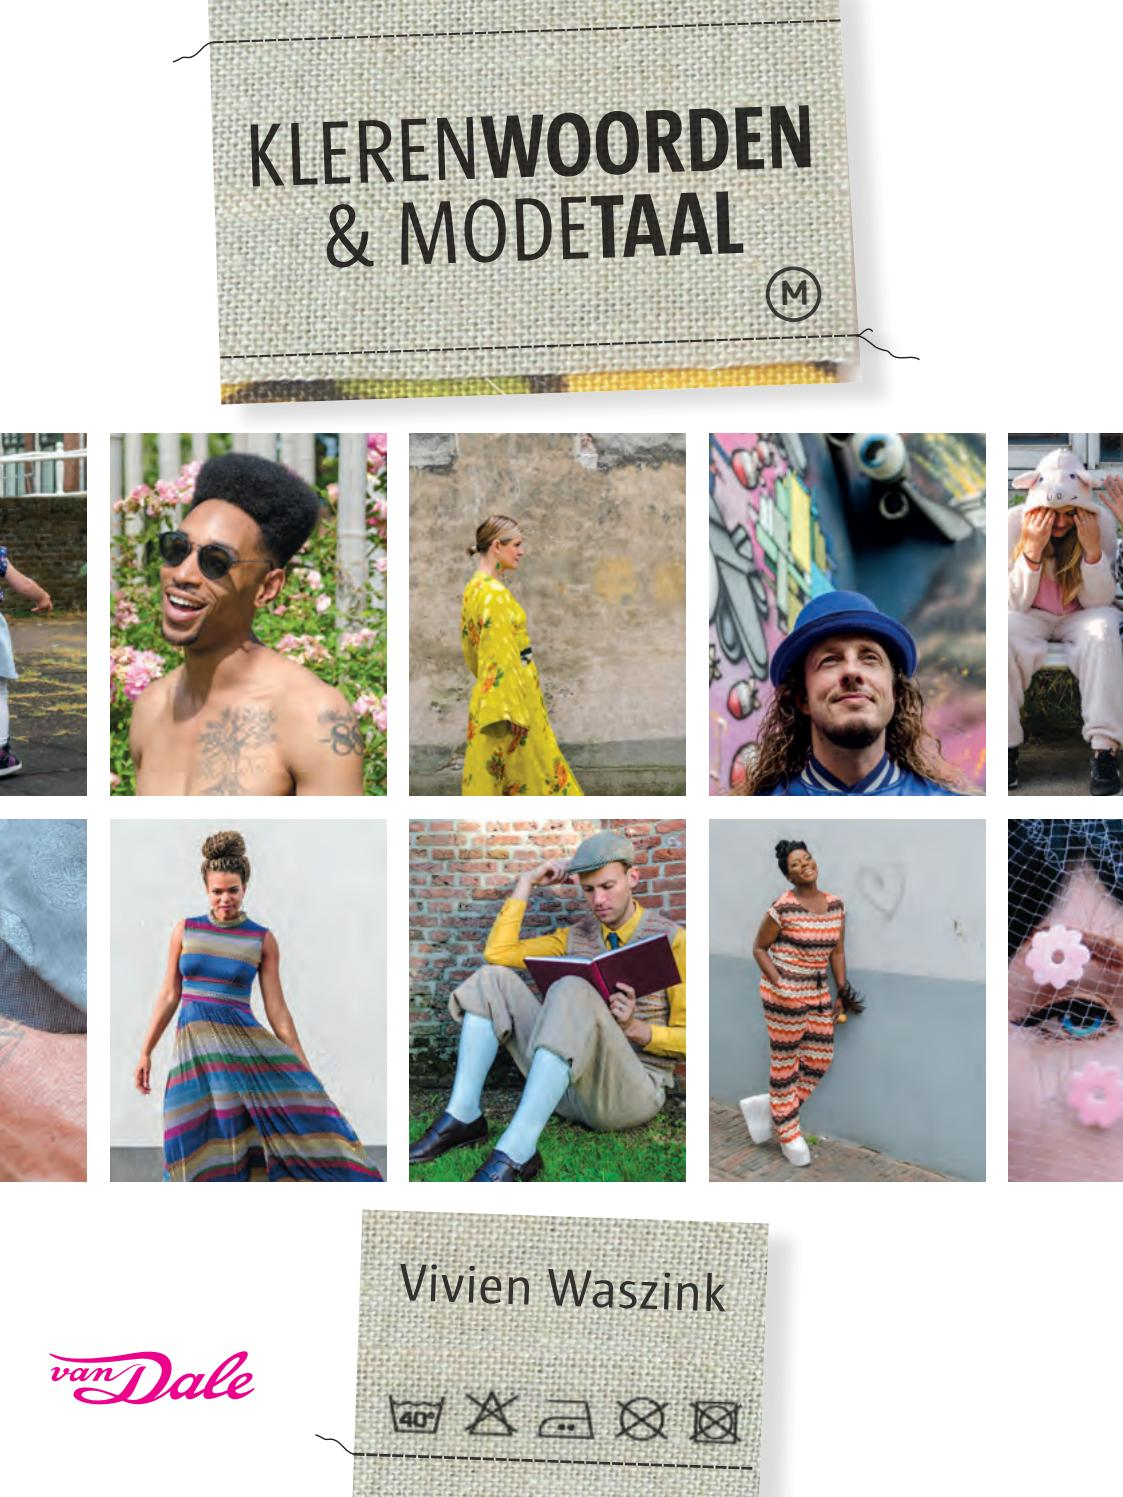 d5edd145e4e1e3 Klerenwoorden en modetaal by Veen Bosch   Keuning uitgeversgroep - issuu